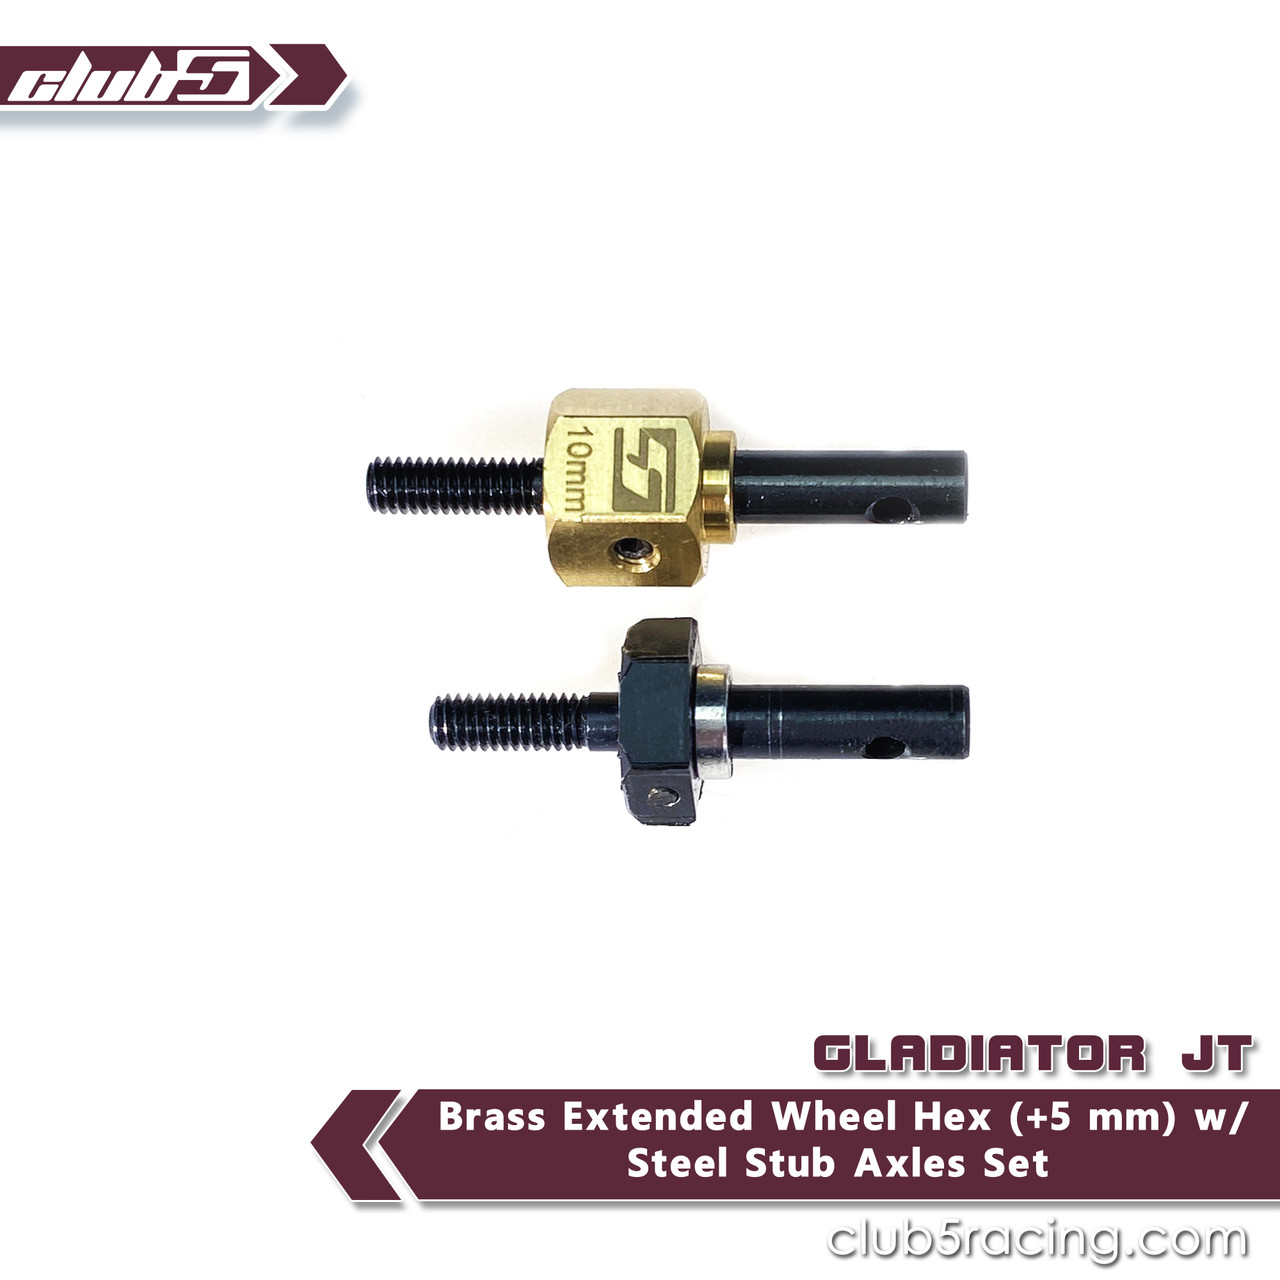 Brass Extended Wheel Hex (+5 mm) w/ Steel Stub Axles Set for SCX10 III Jeep JL Wrangler / JT Gladiator